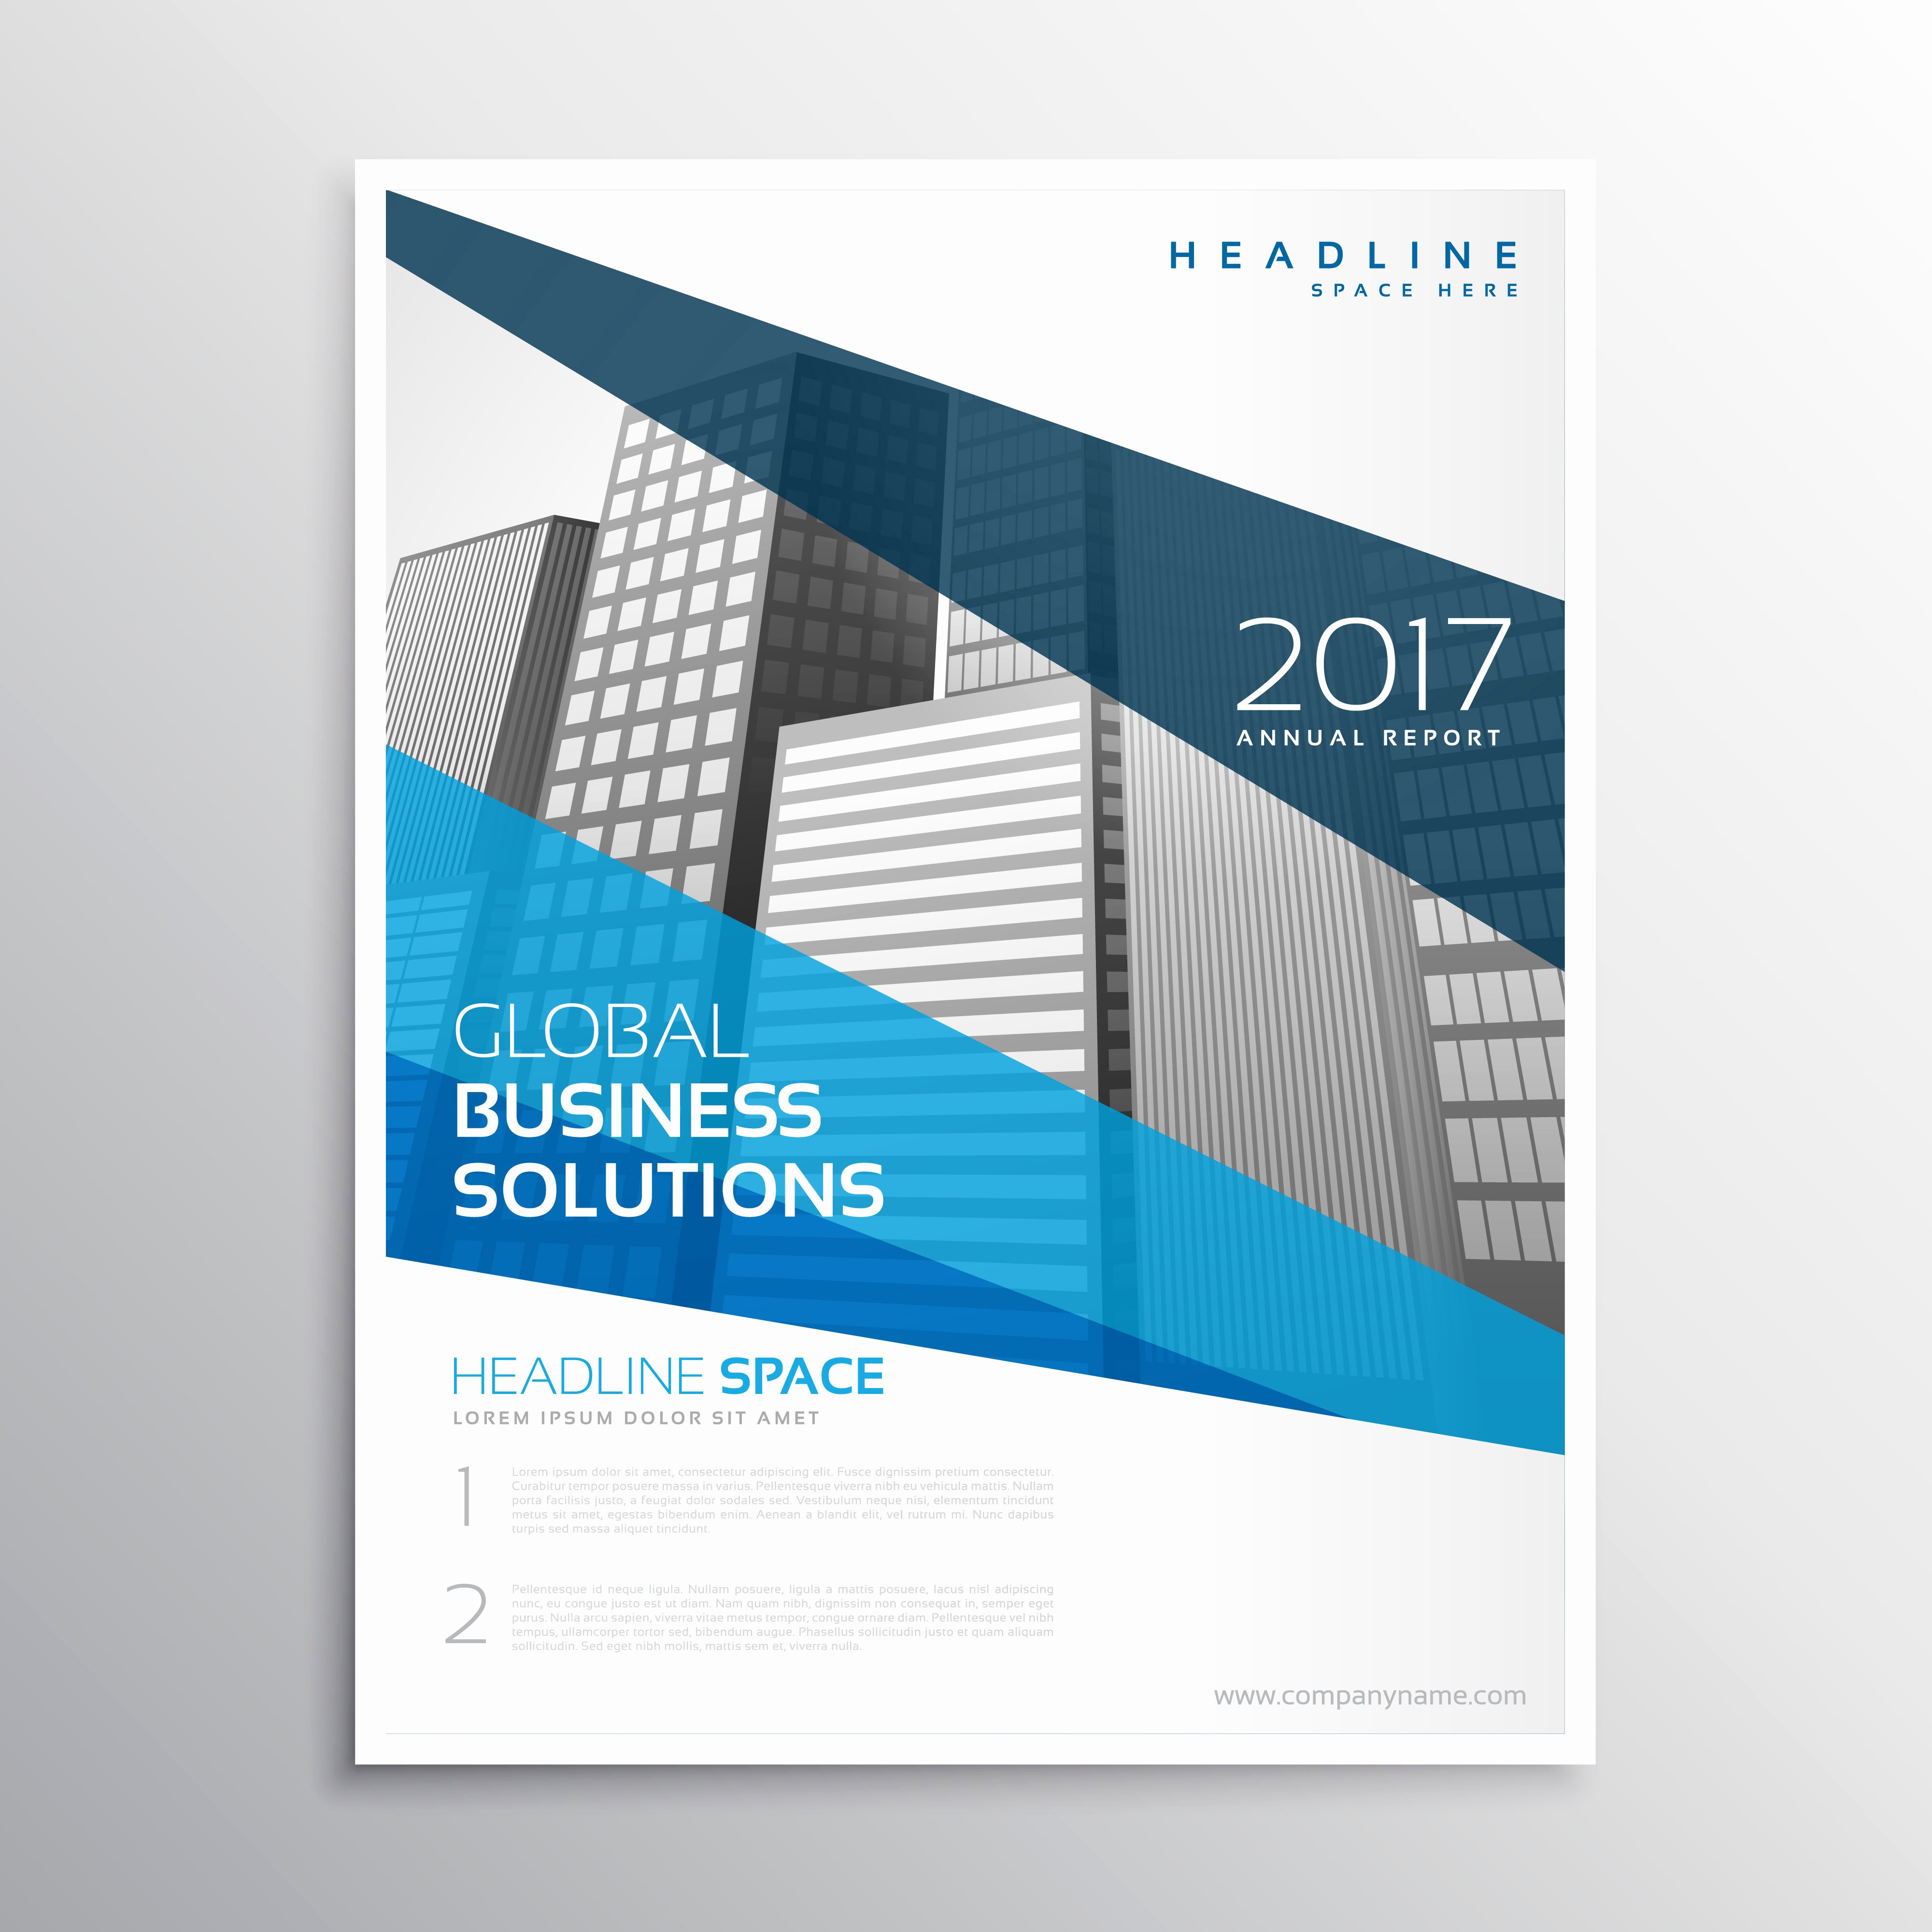 Annual Report Design Template Beautiful Clean Geometric Blue Brochure Template Design for Annual